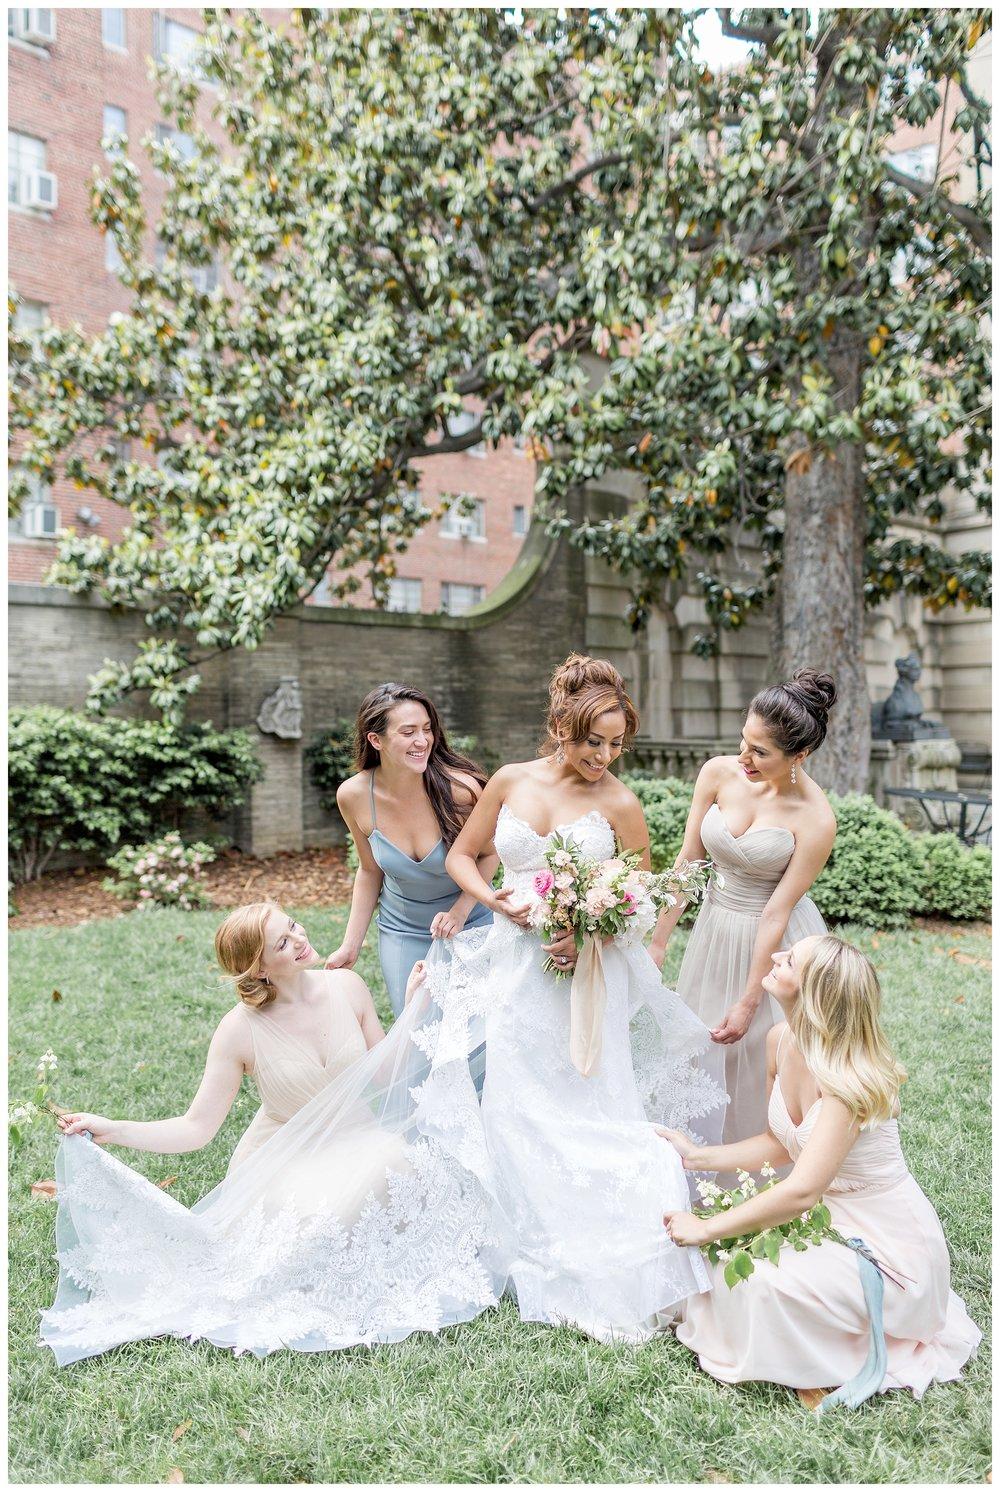 Anderson House Wedding DC Wedding Photographer Kir Tuben_0019.jpg